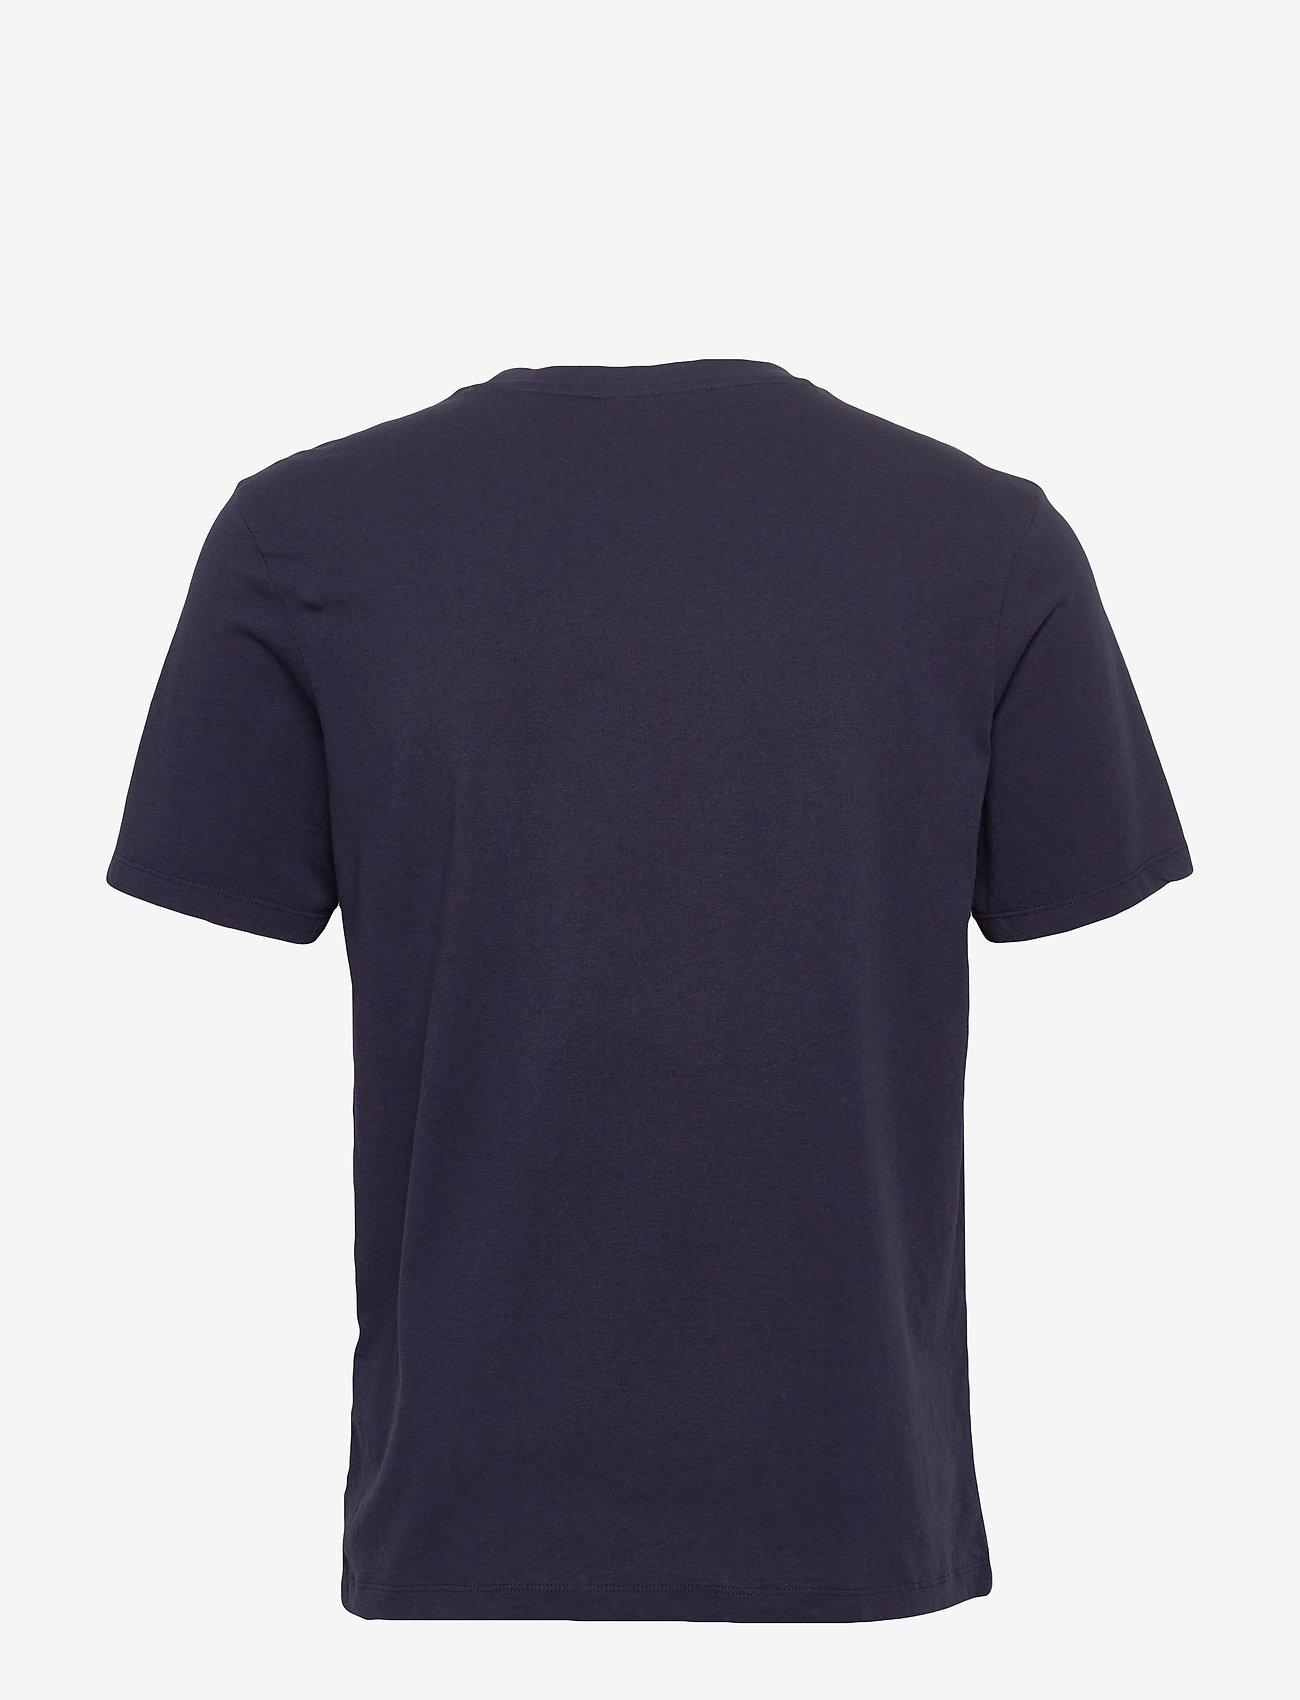 Scotch & Soda - Scotch & Soda crew neck logo tee - short-sleeved t-shirts - night - 1